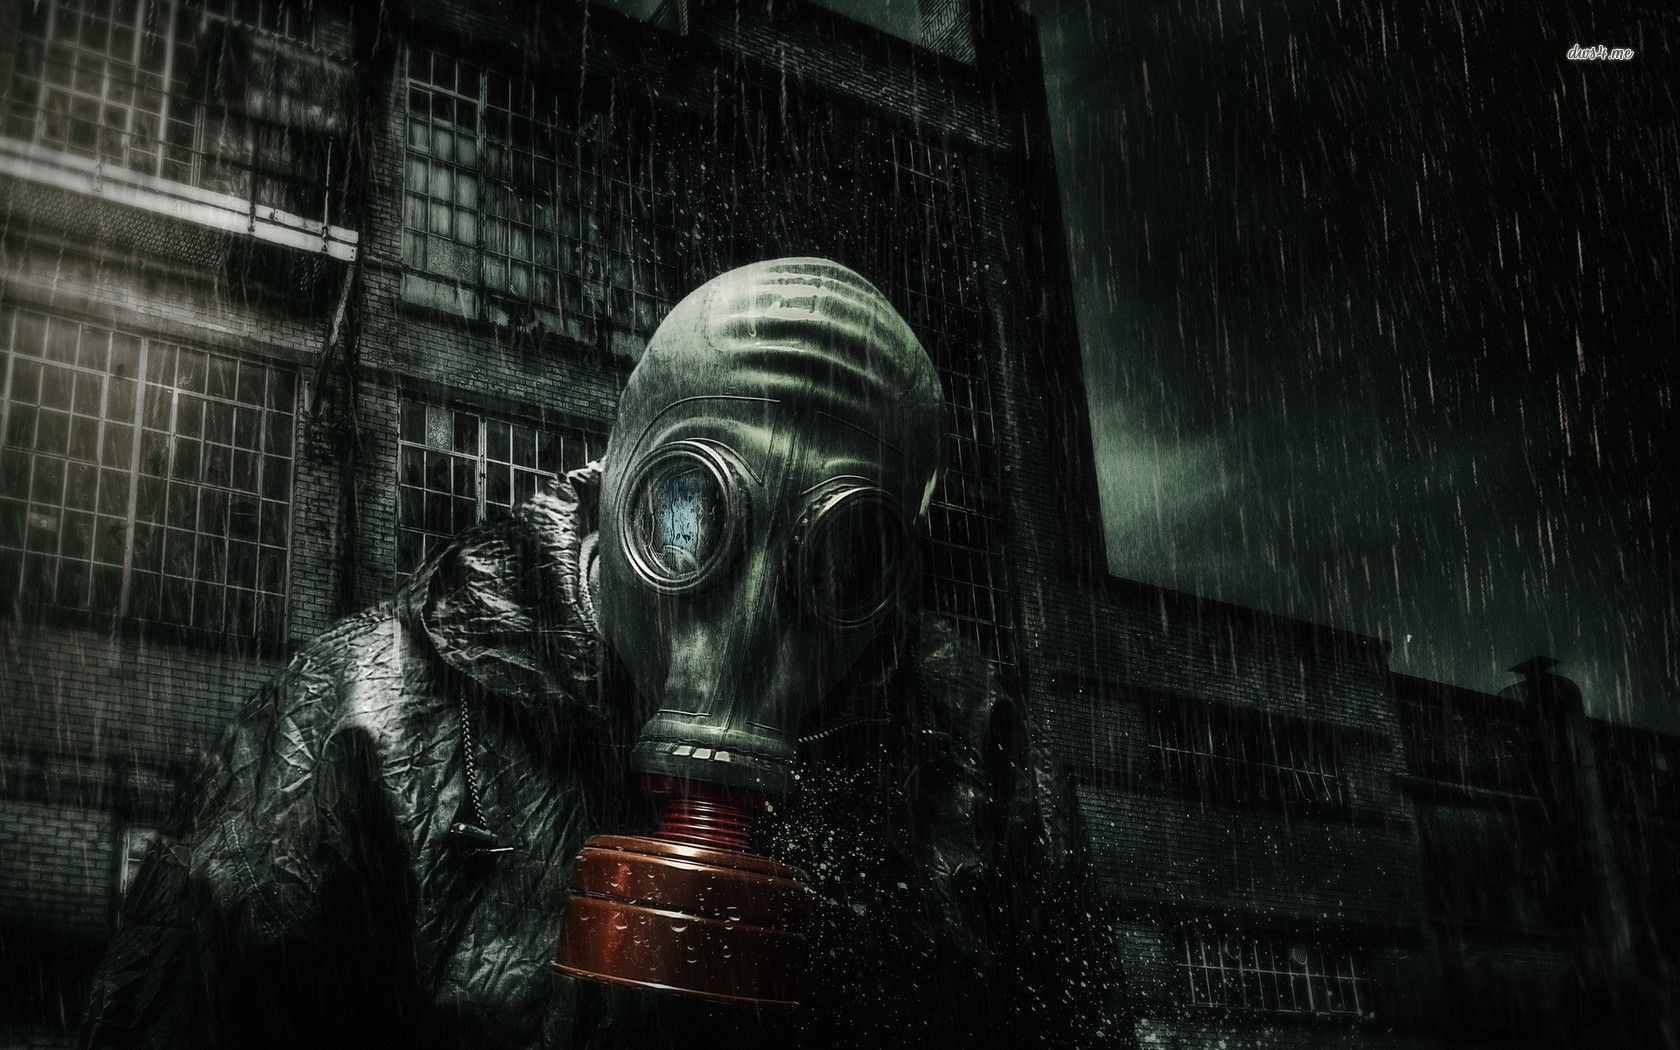 Gas Mask Art Wearing A Gas Mask In The Rain Wallpaper